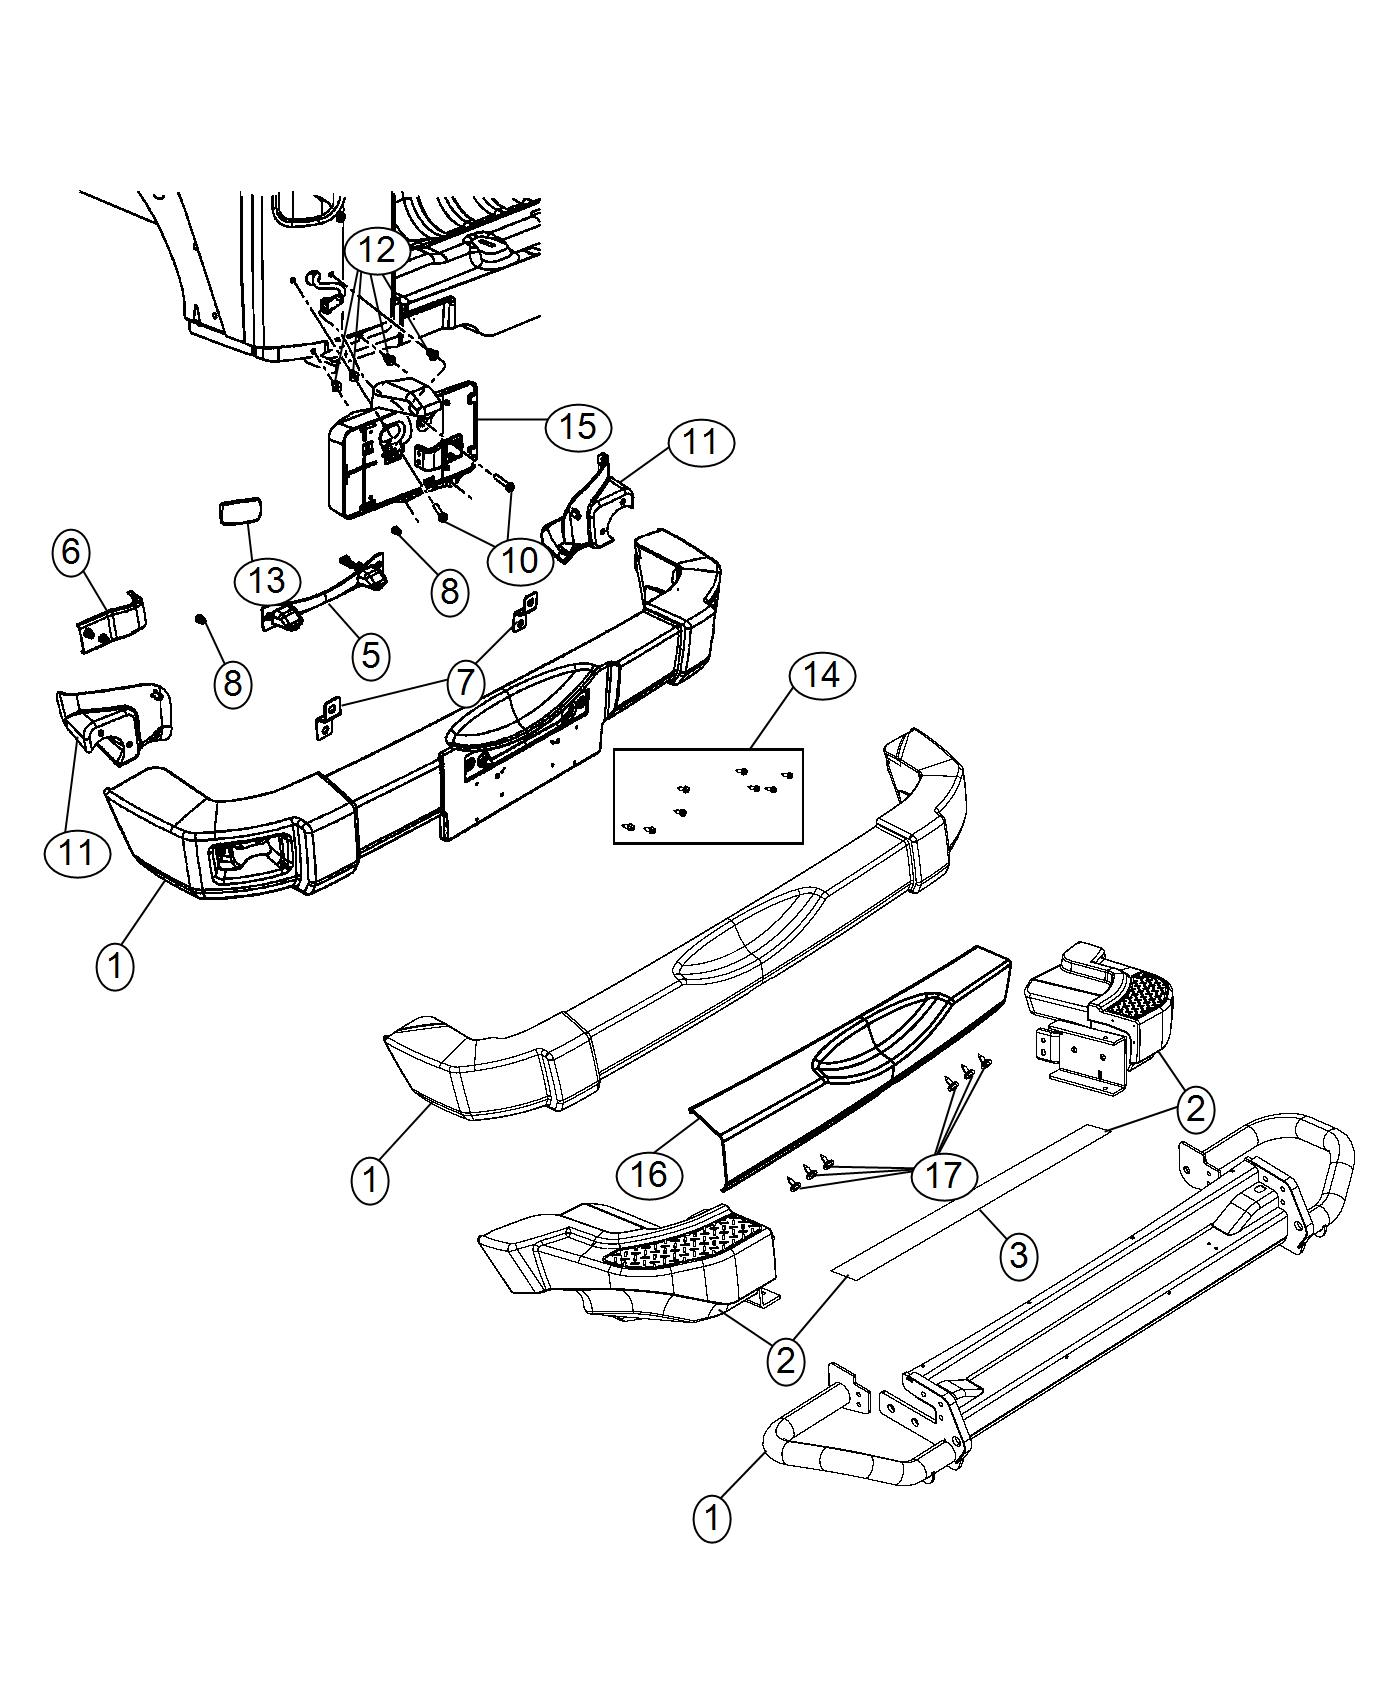 Jeep Wrangler Applique. Fascia. Color: [no description